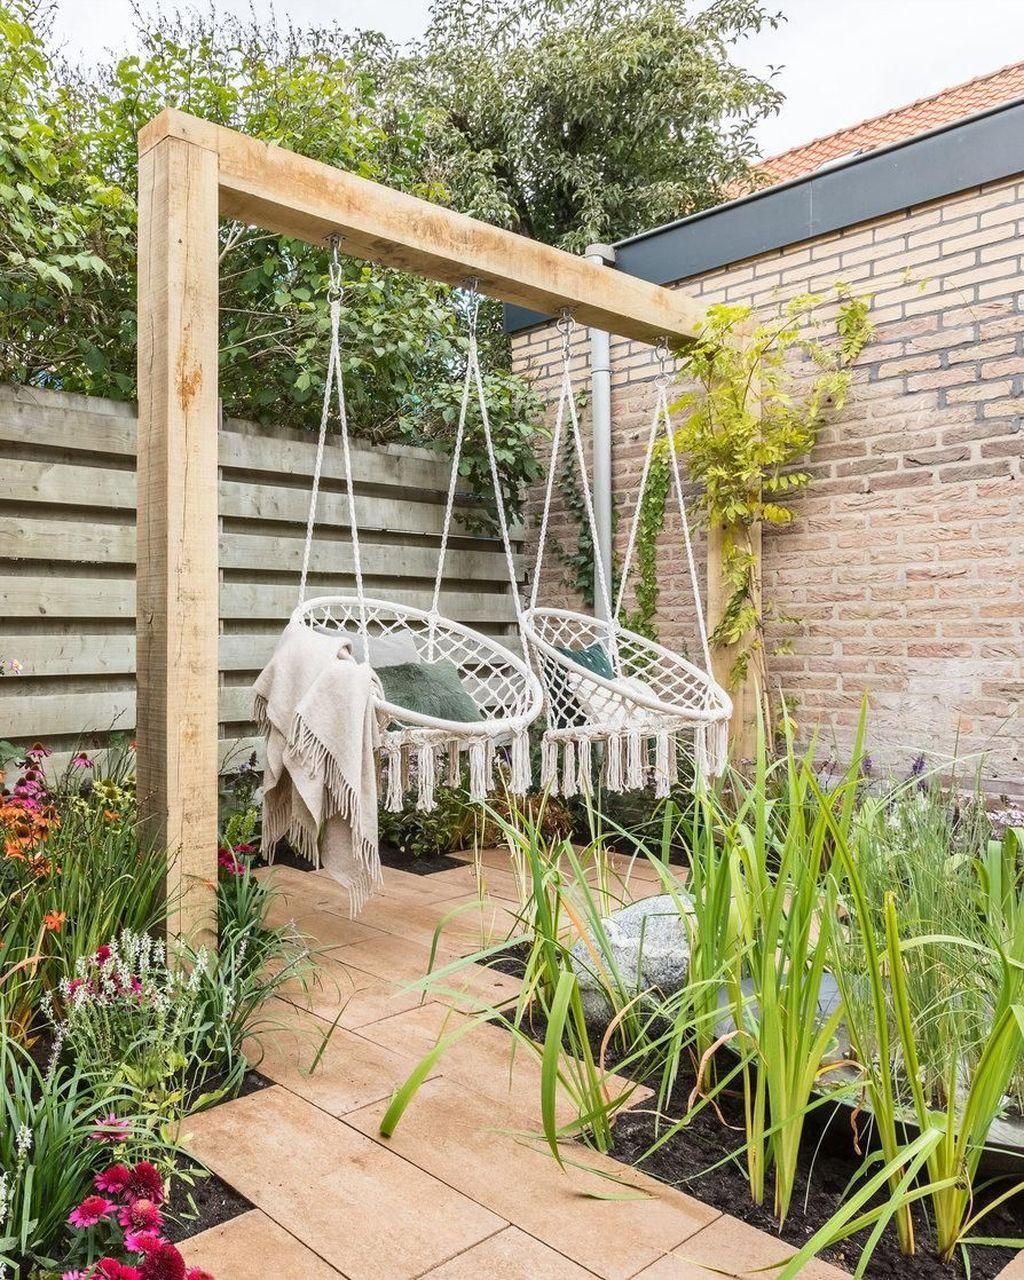 80 Awesome Garden Swing Seats Ideas for Backyard Relaxing